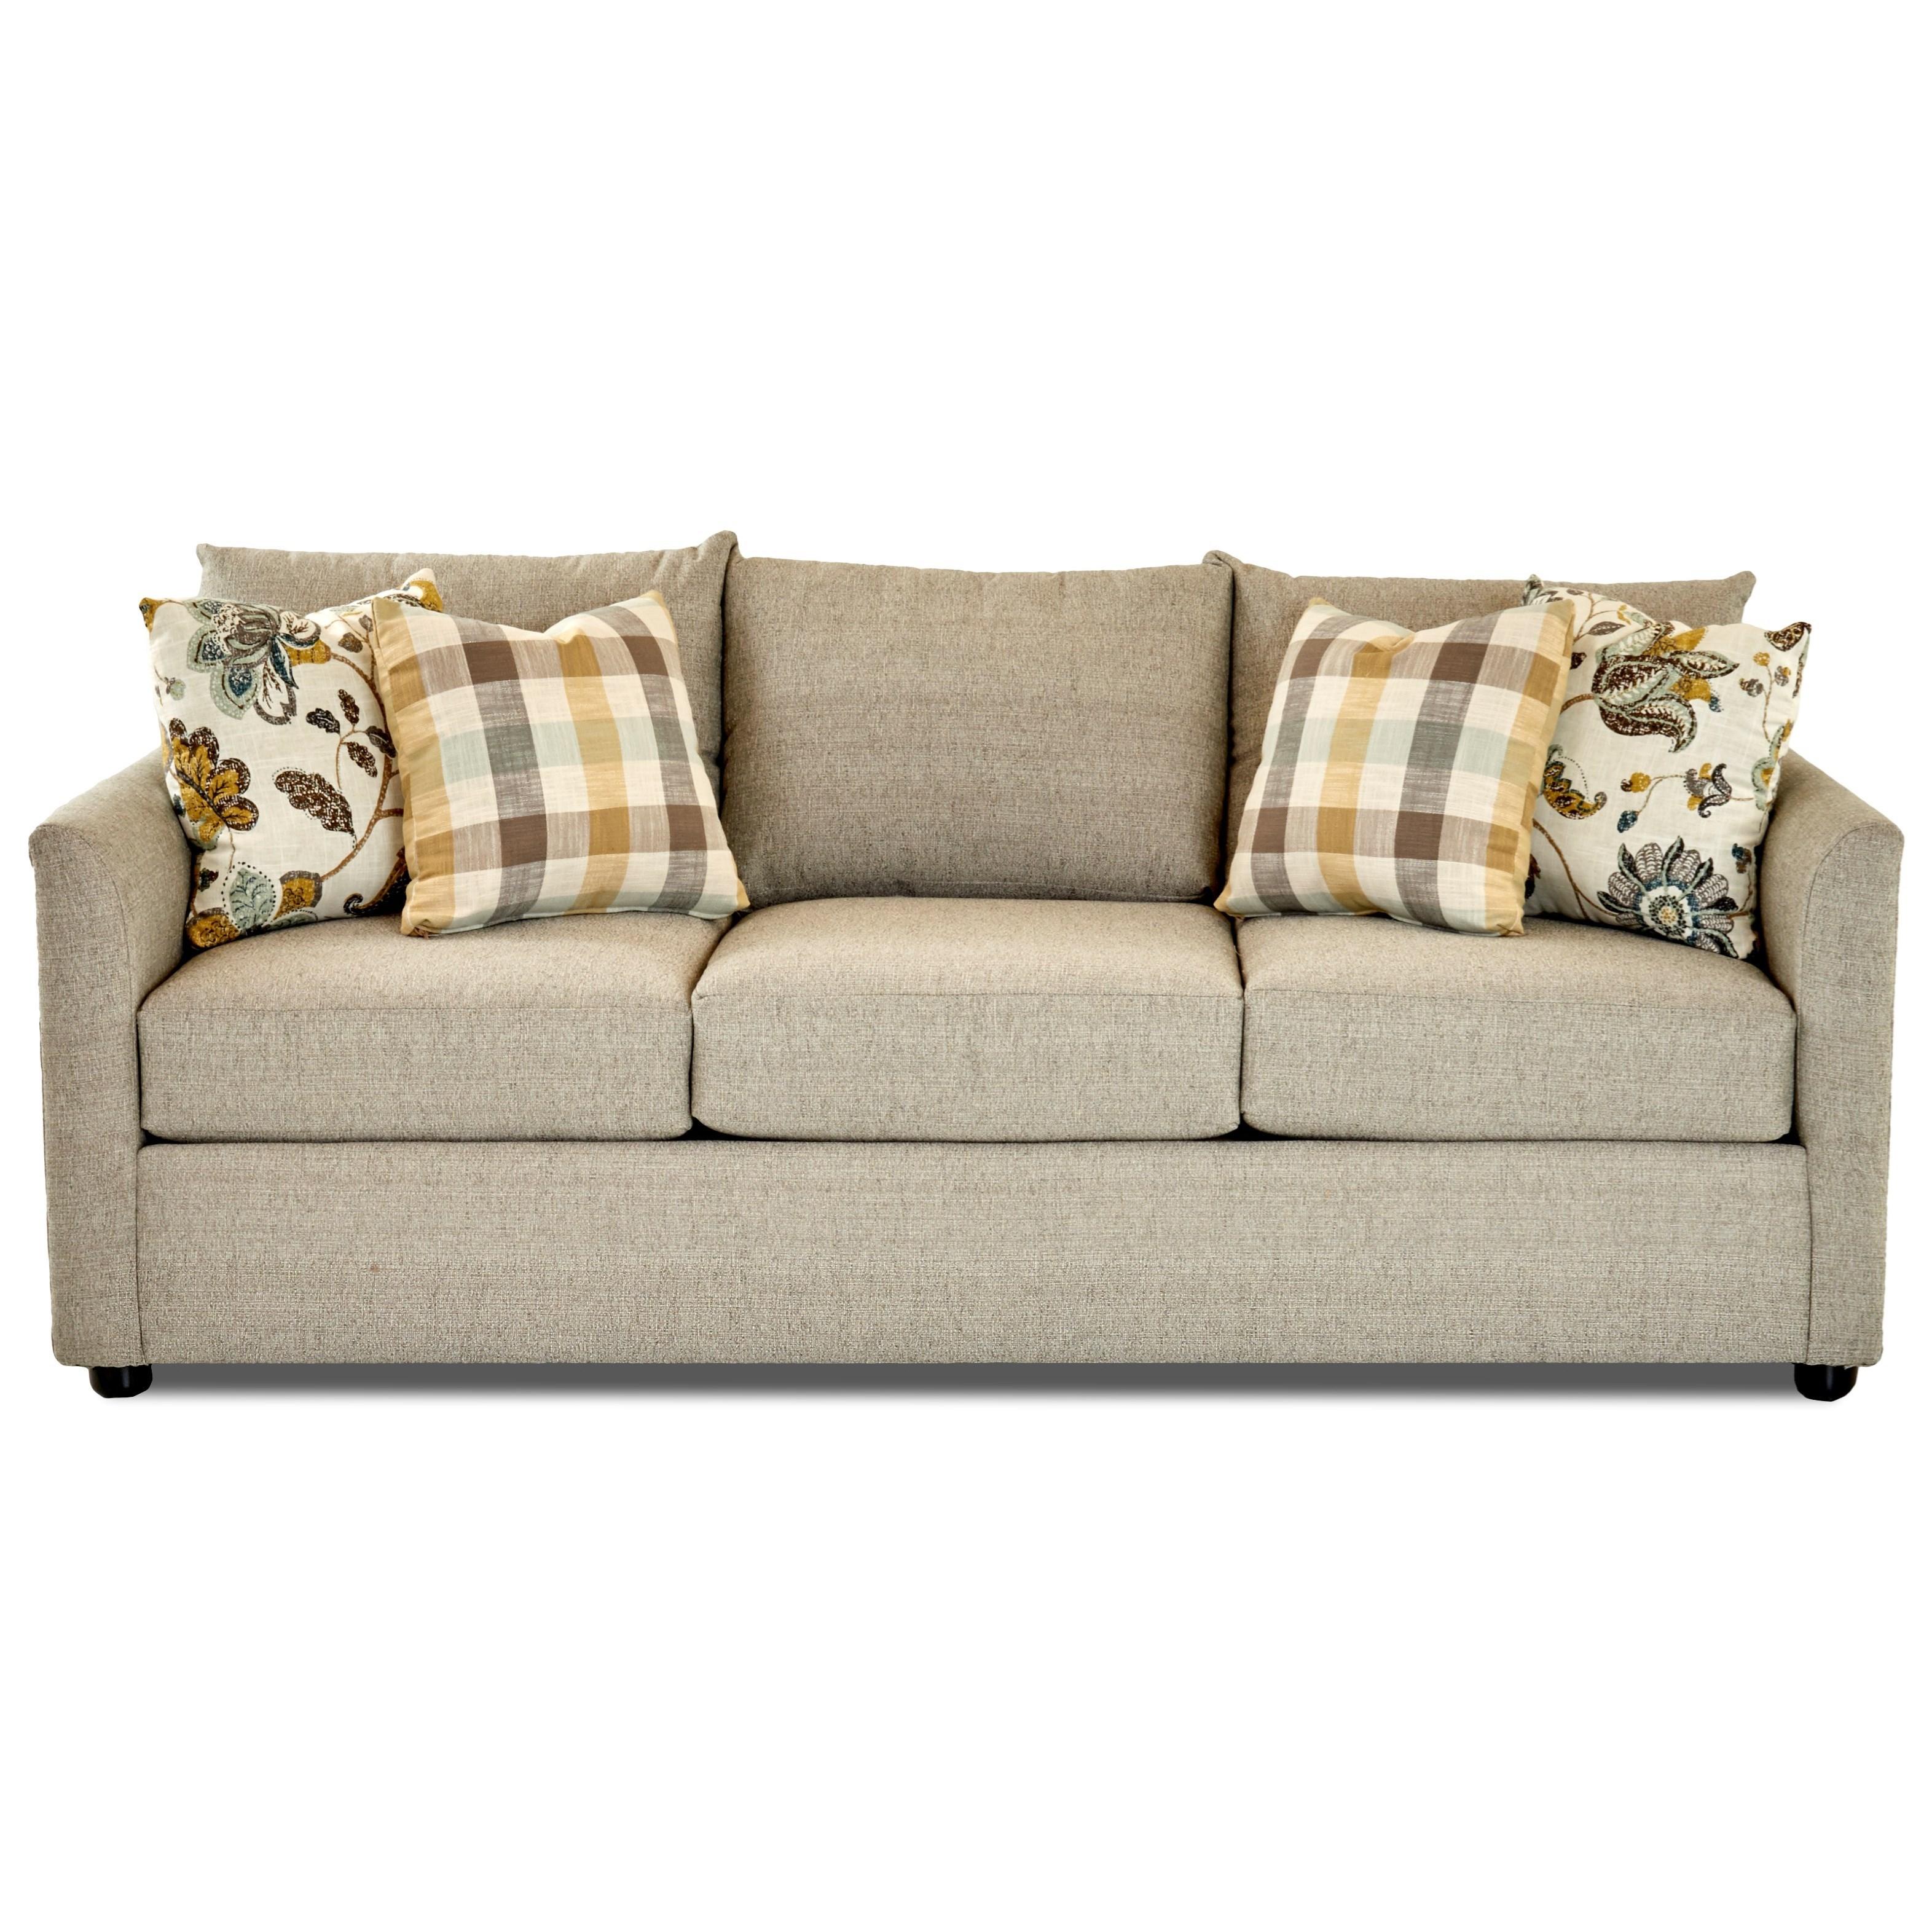 Atlanta K27800 S Transitional Sofa